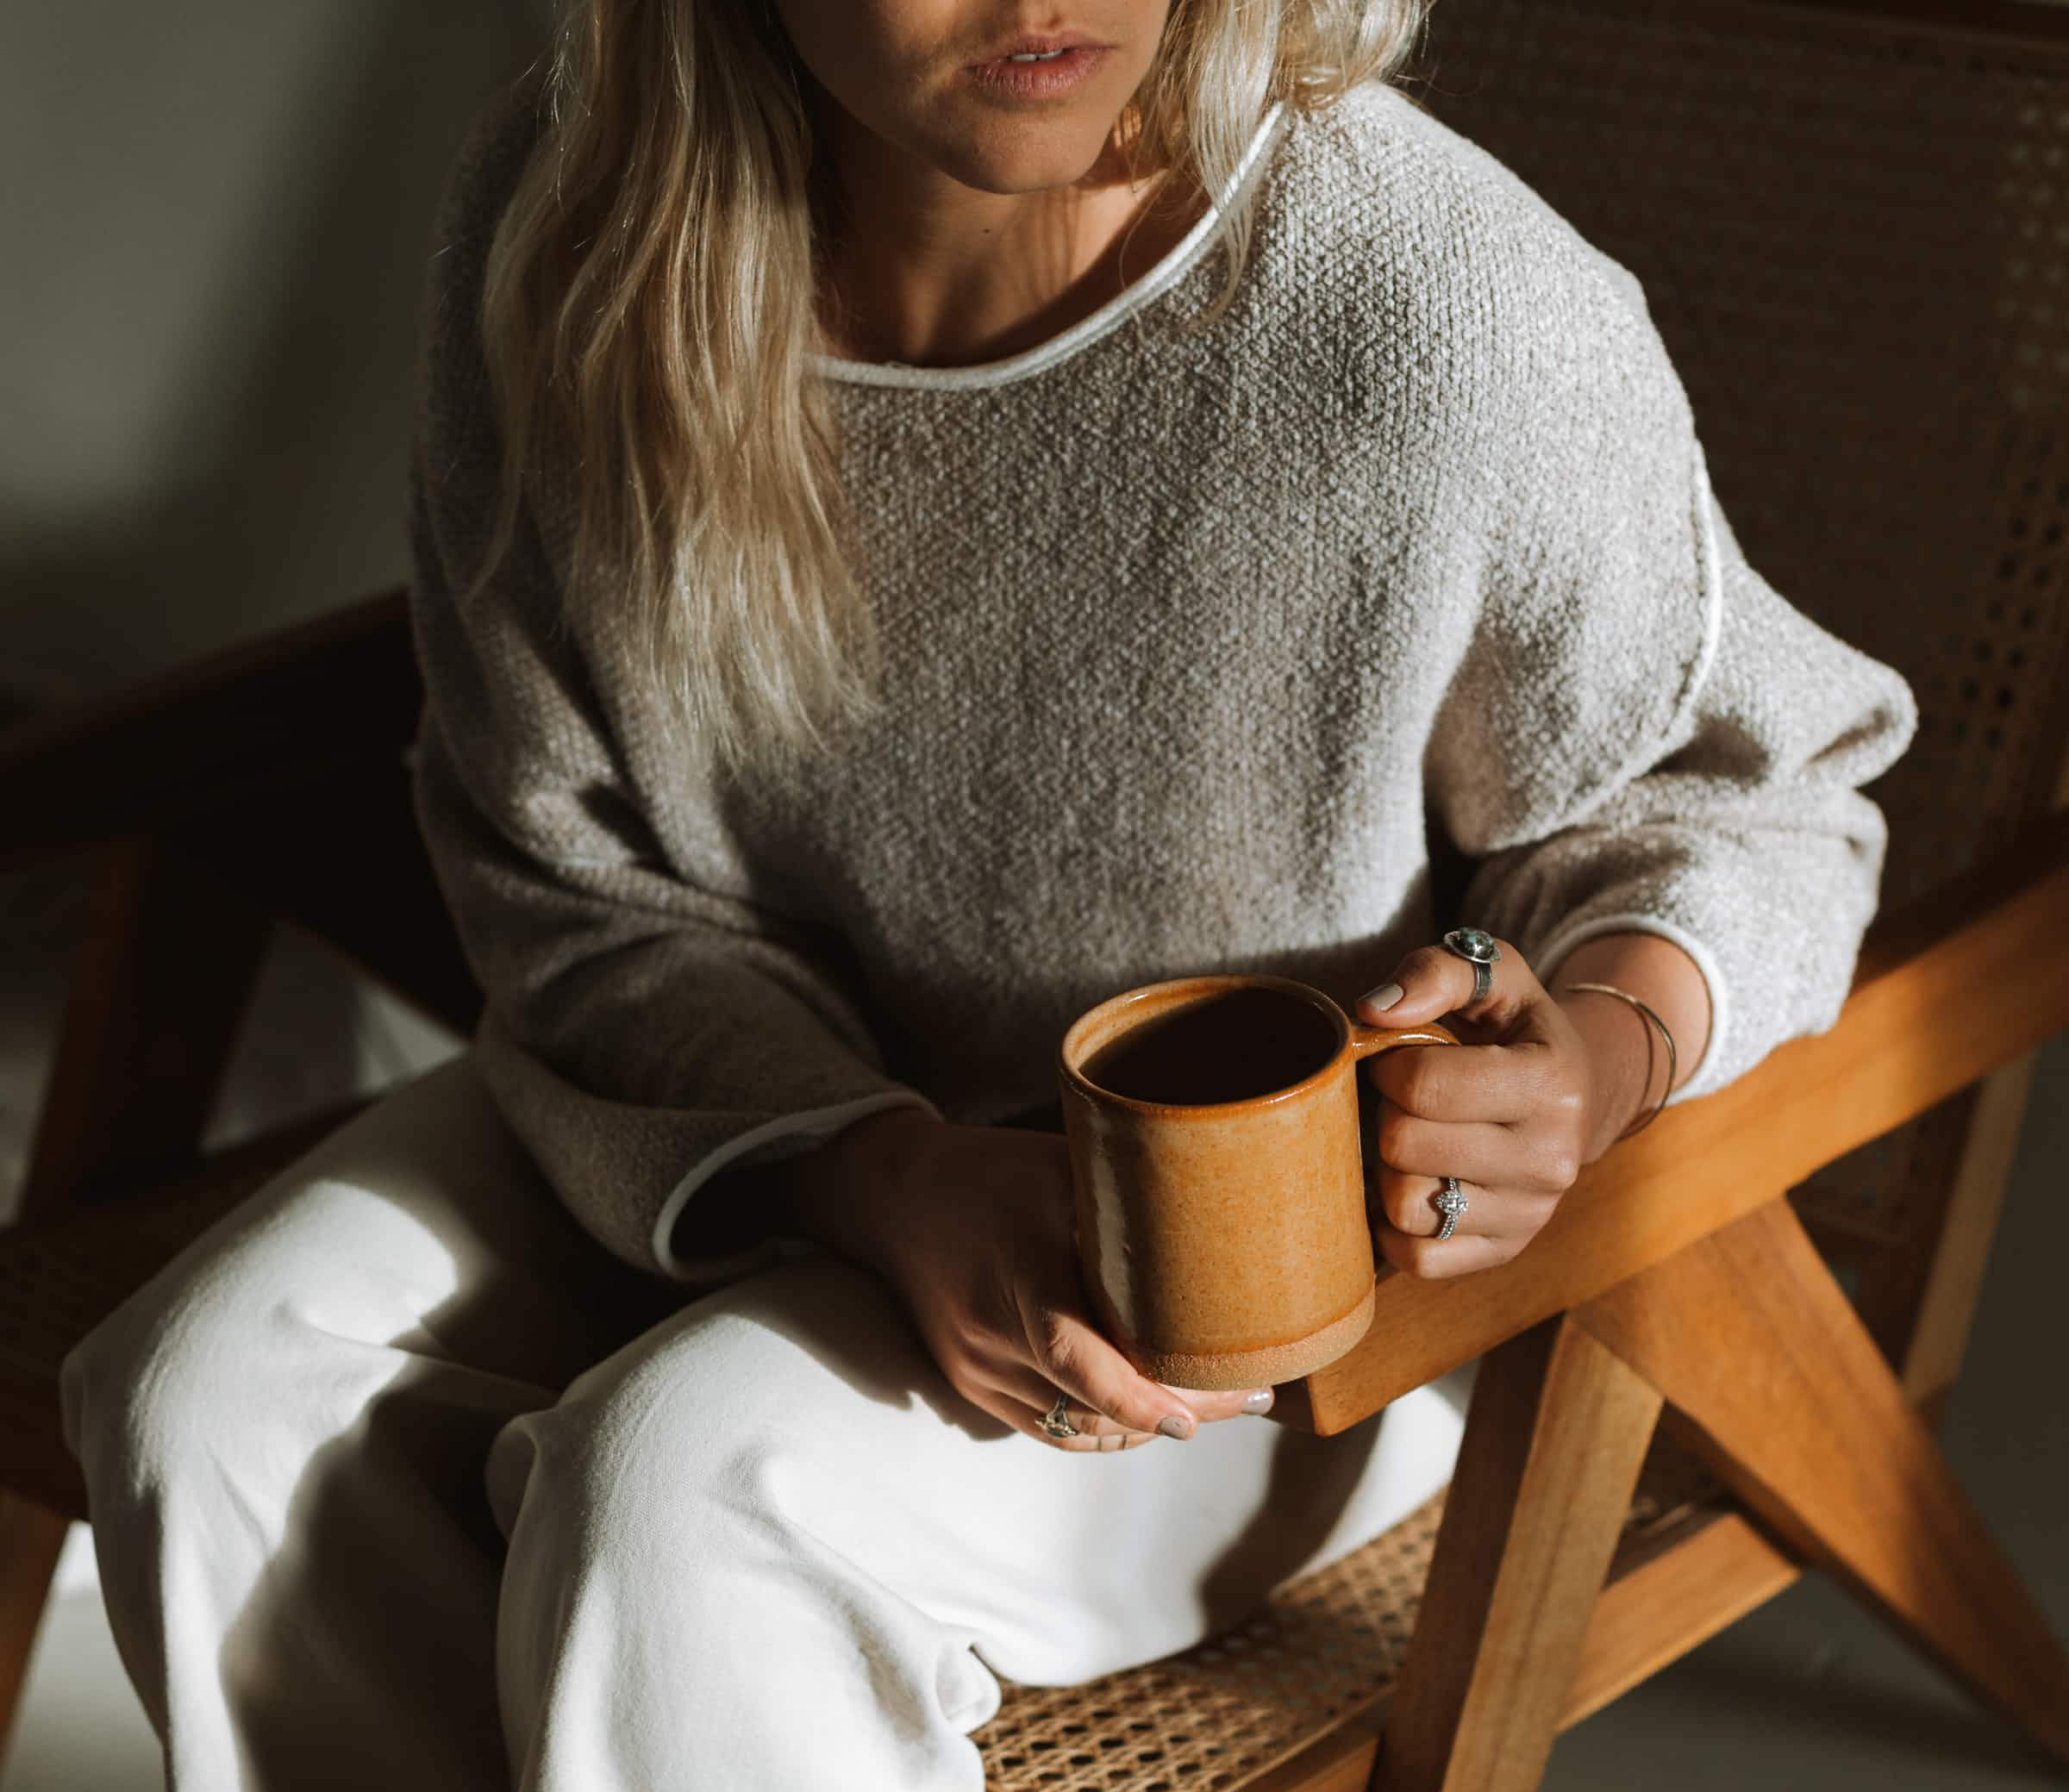 Rustic coffee mugs guide